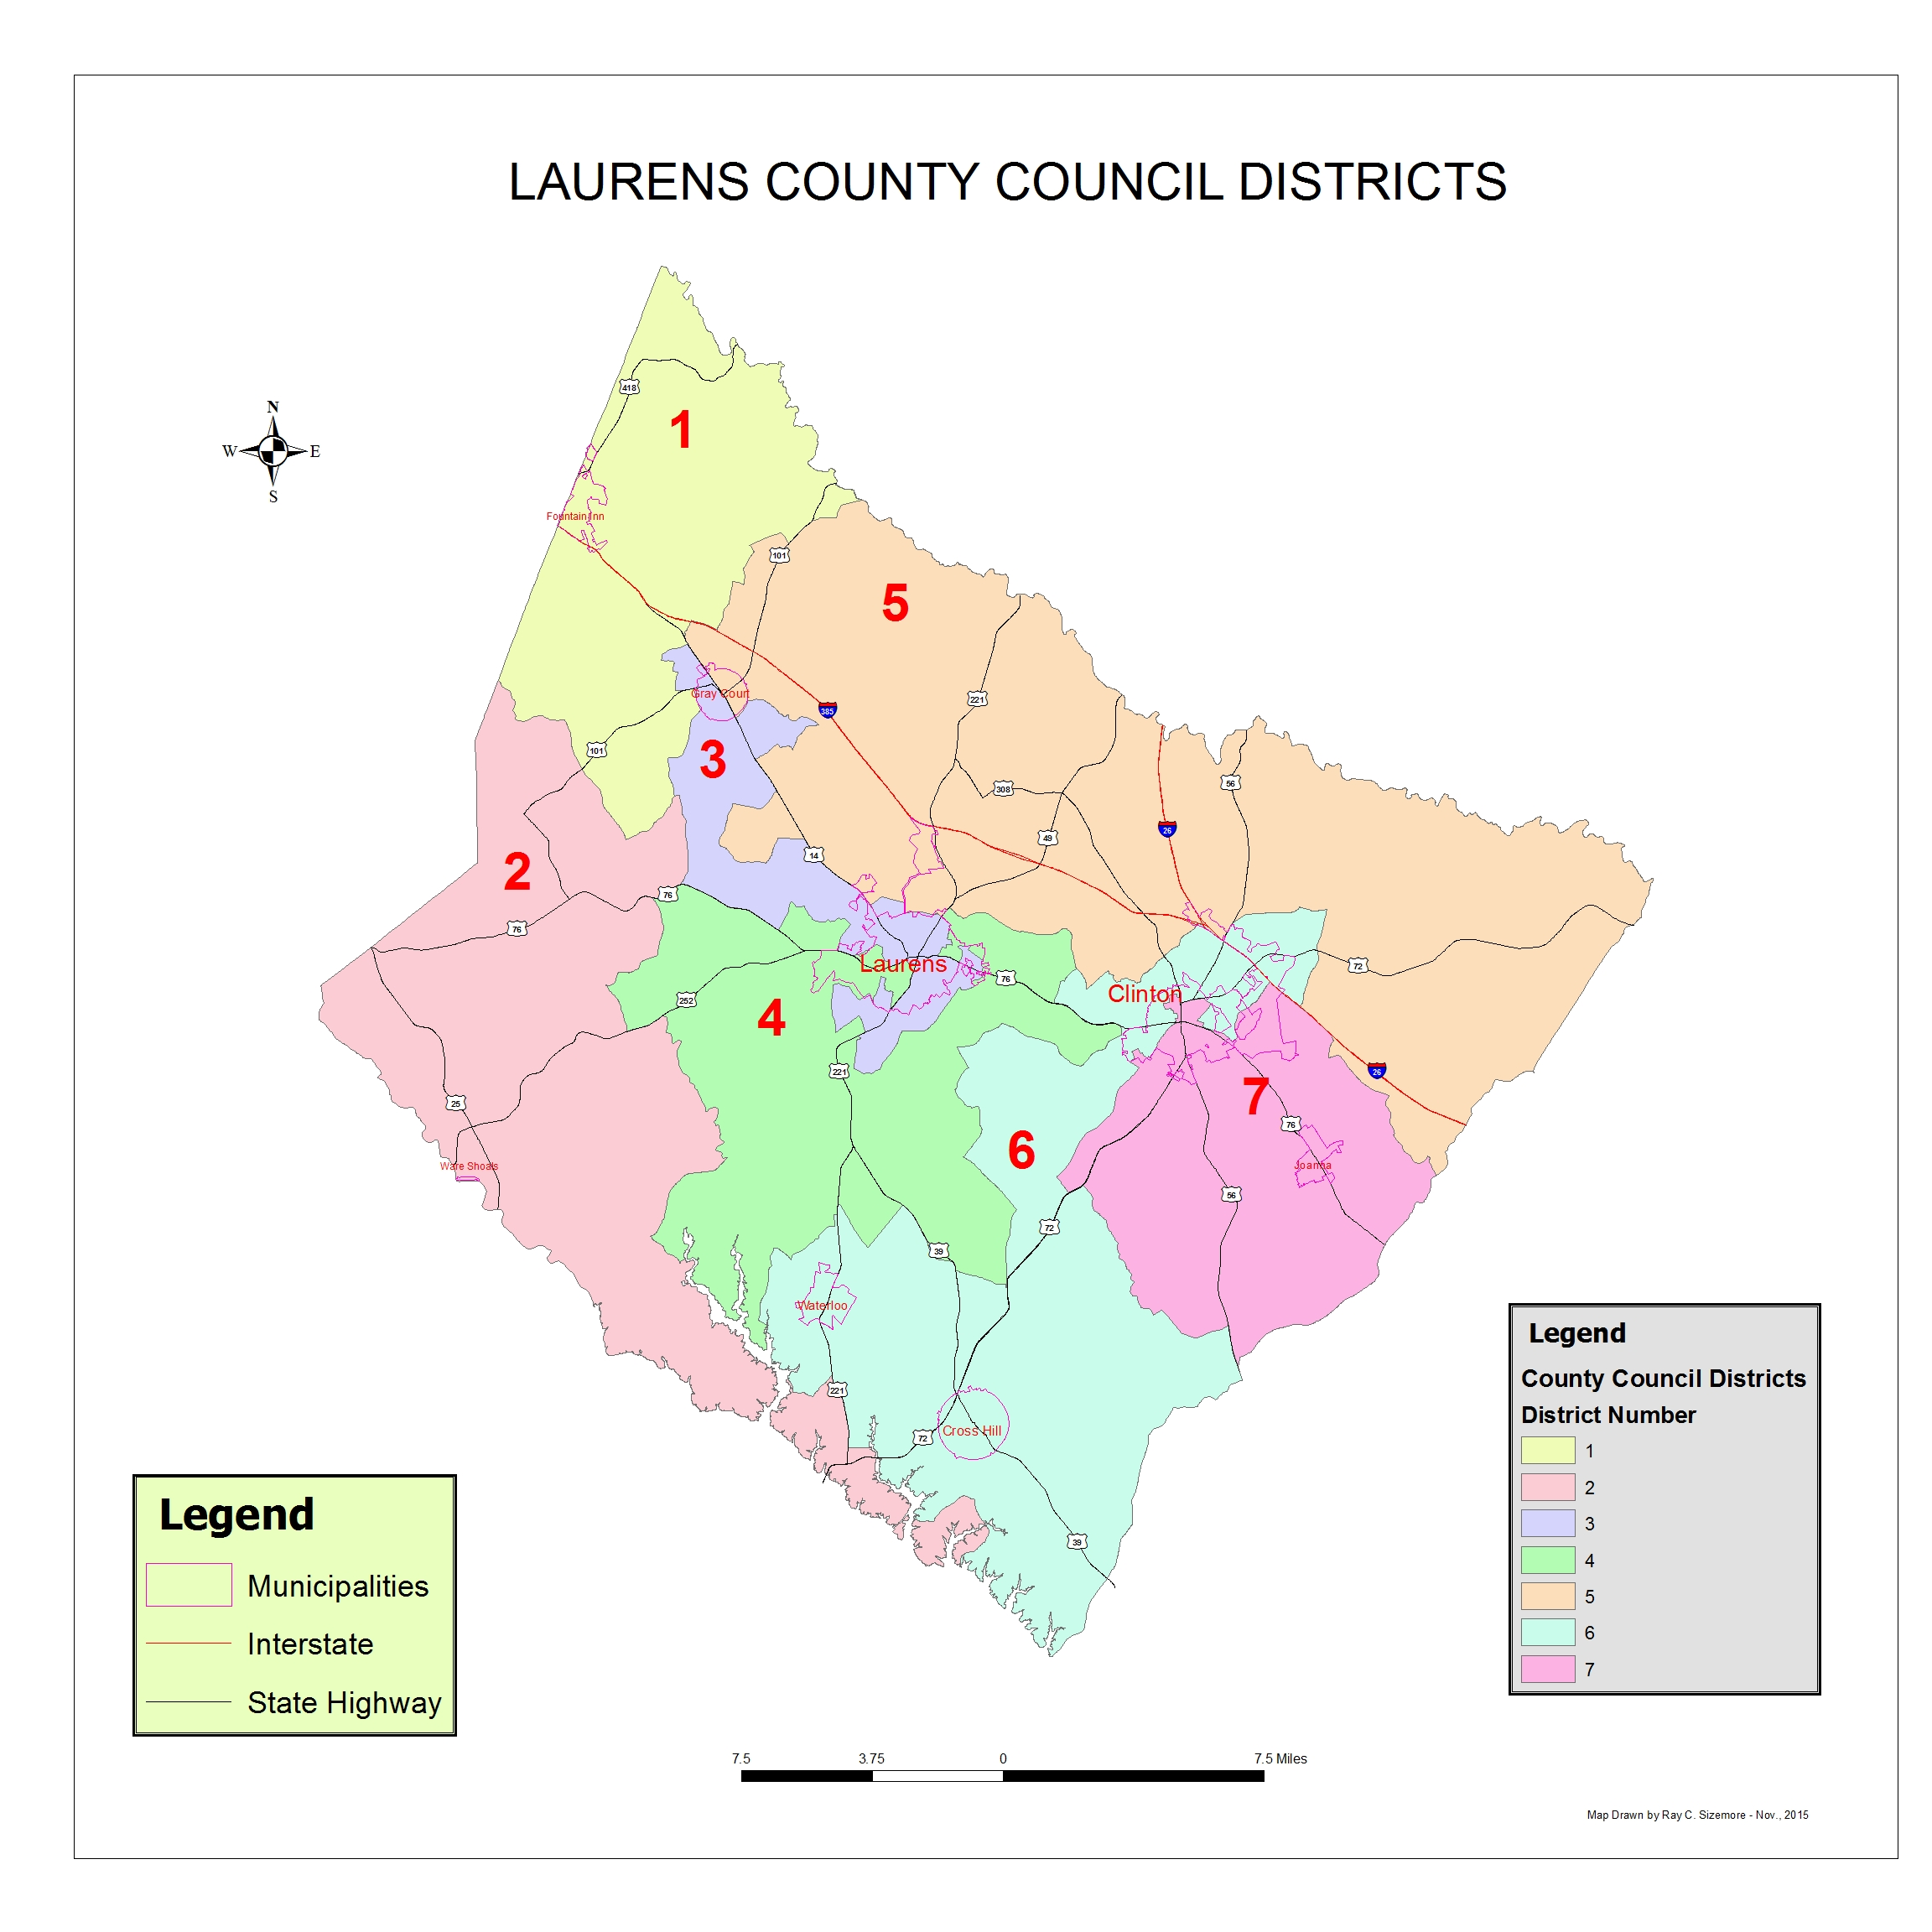 County Council Distrists